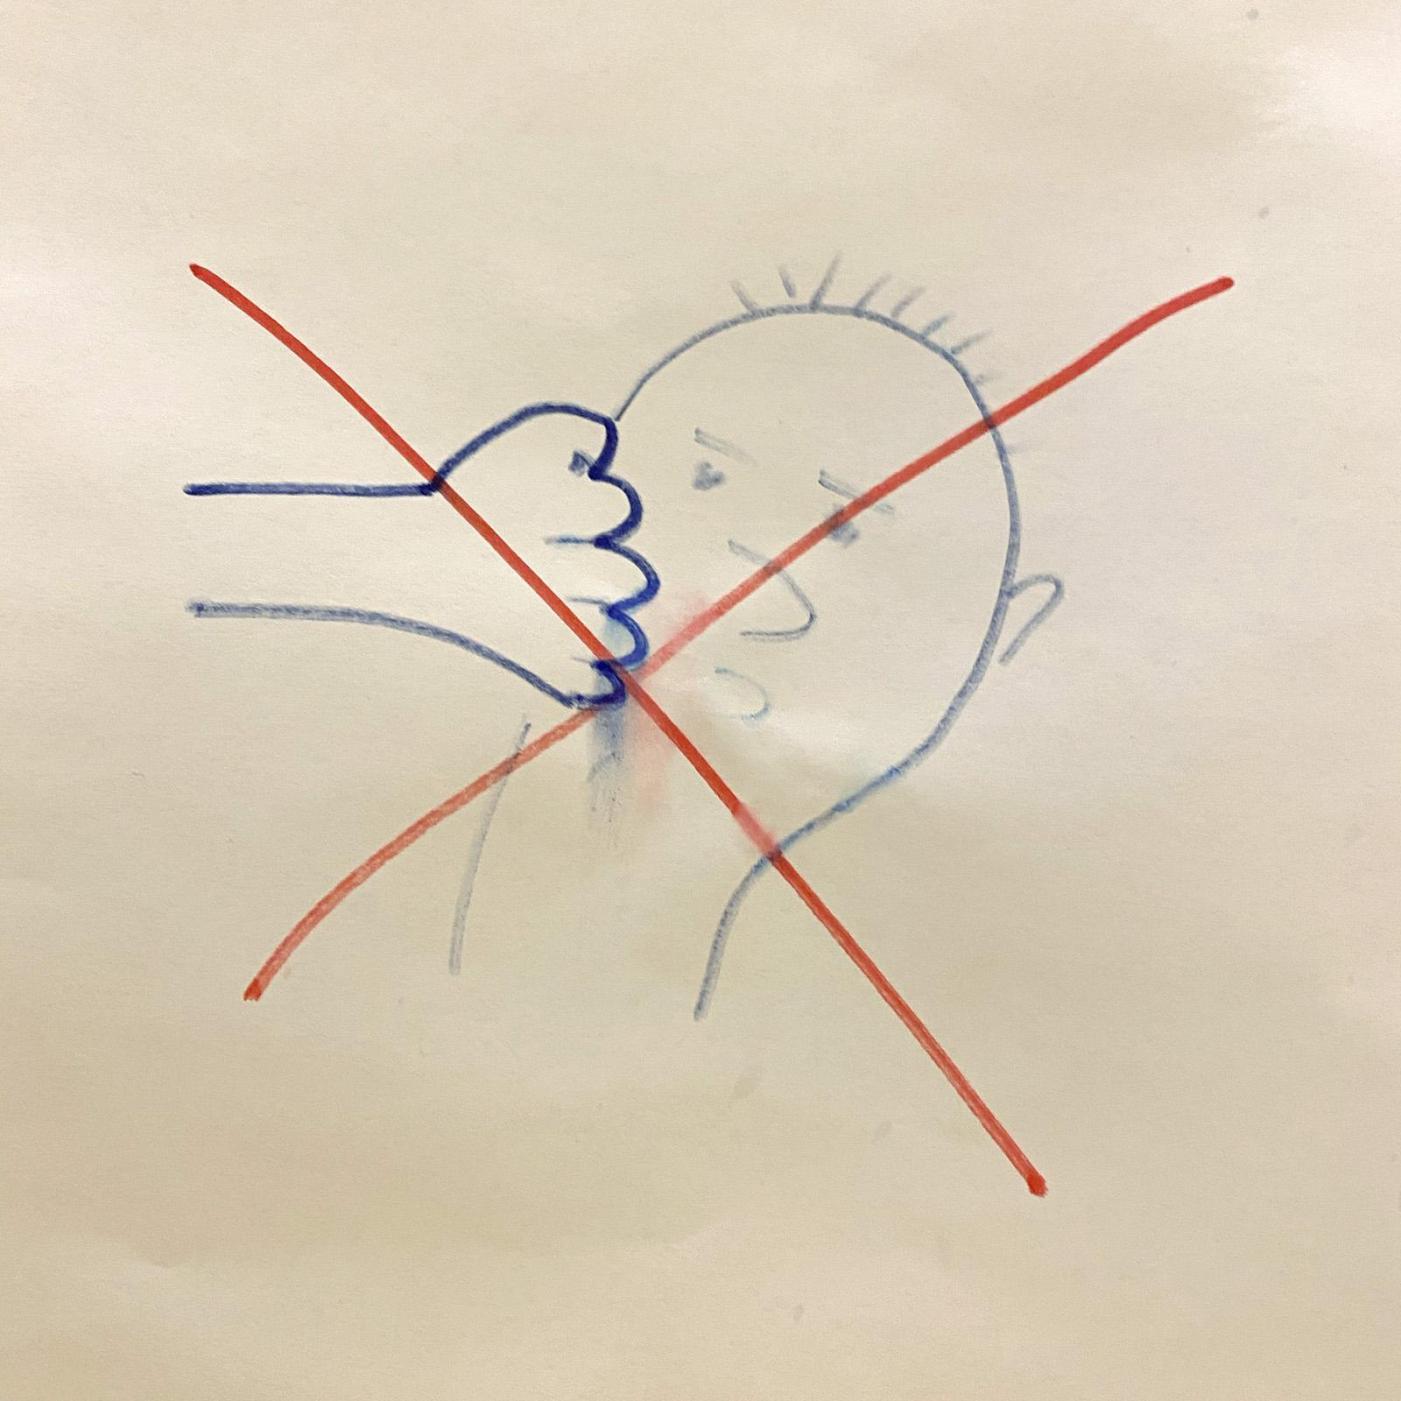 Kita-Icon.thumb.jpg.d9ff05999be910b4fc6b258bf6a93bd8.jpg